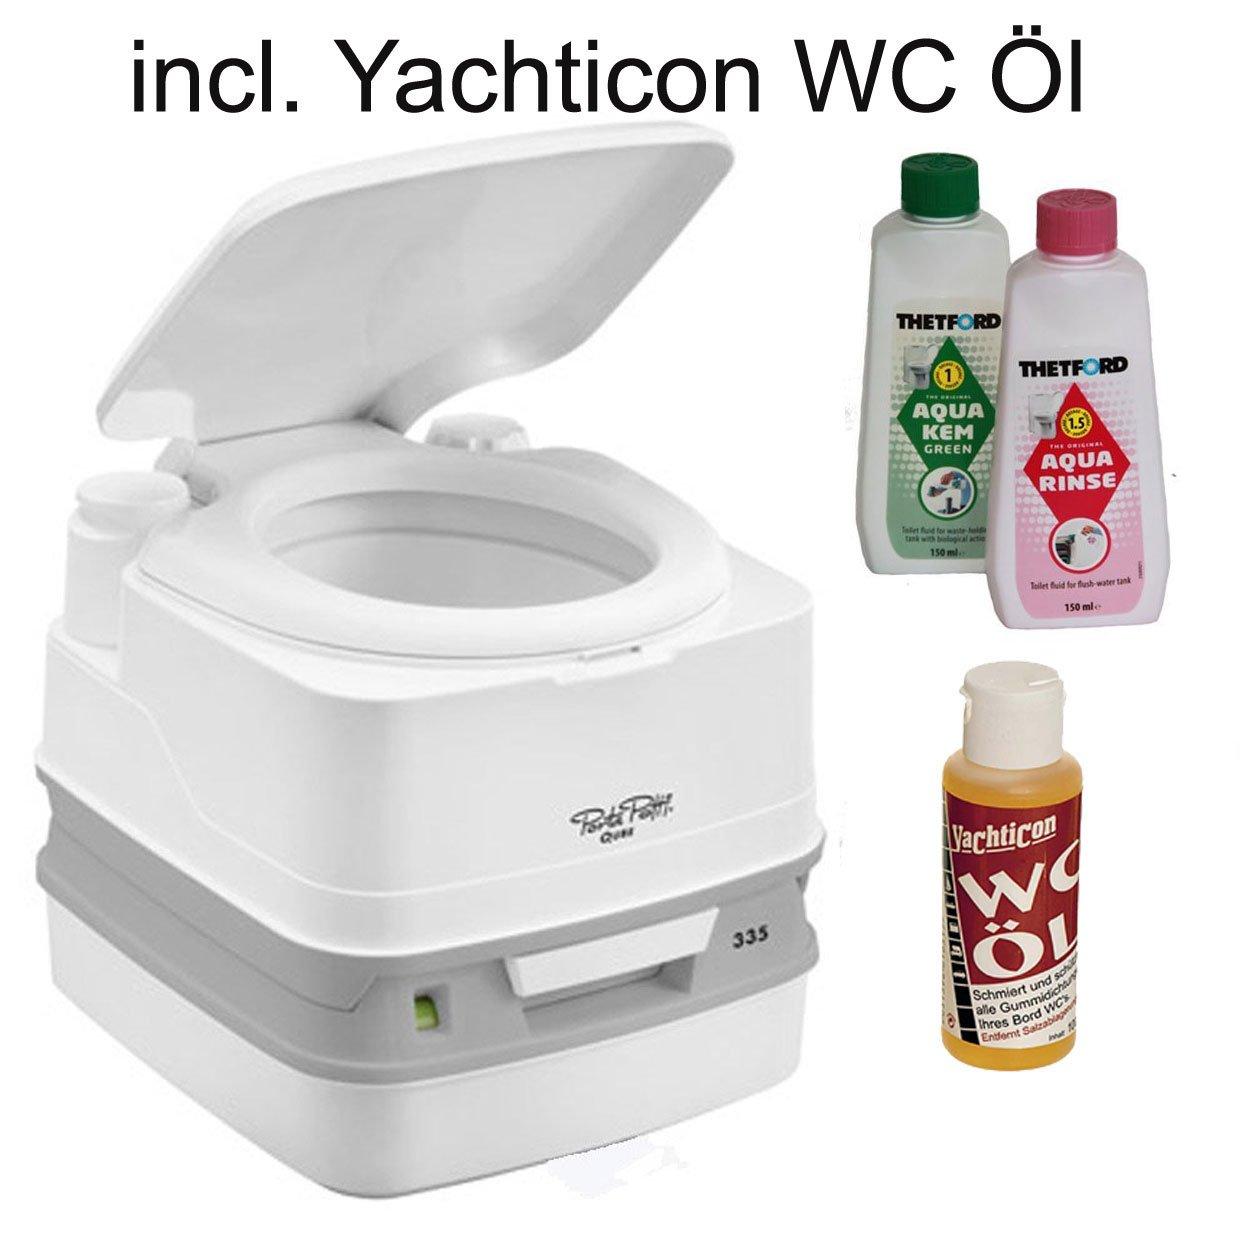 Thetford Tragbare Frischwassertoilette Porta Potti PP 335 Stiefelshop Edition incl. Yachticon WC Öl